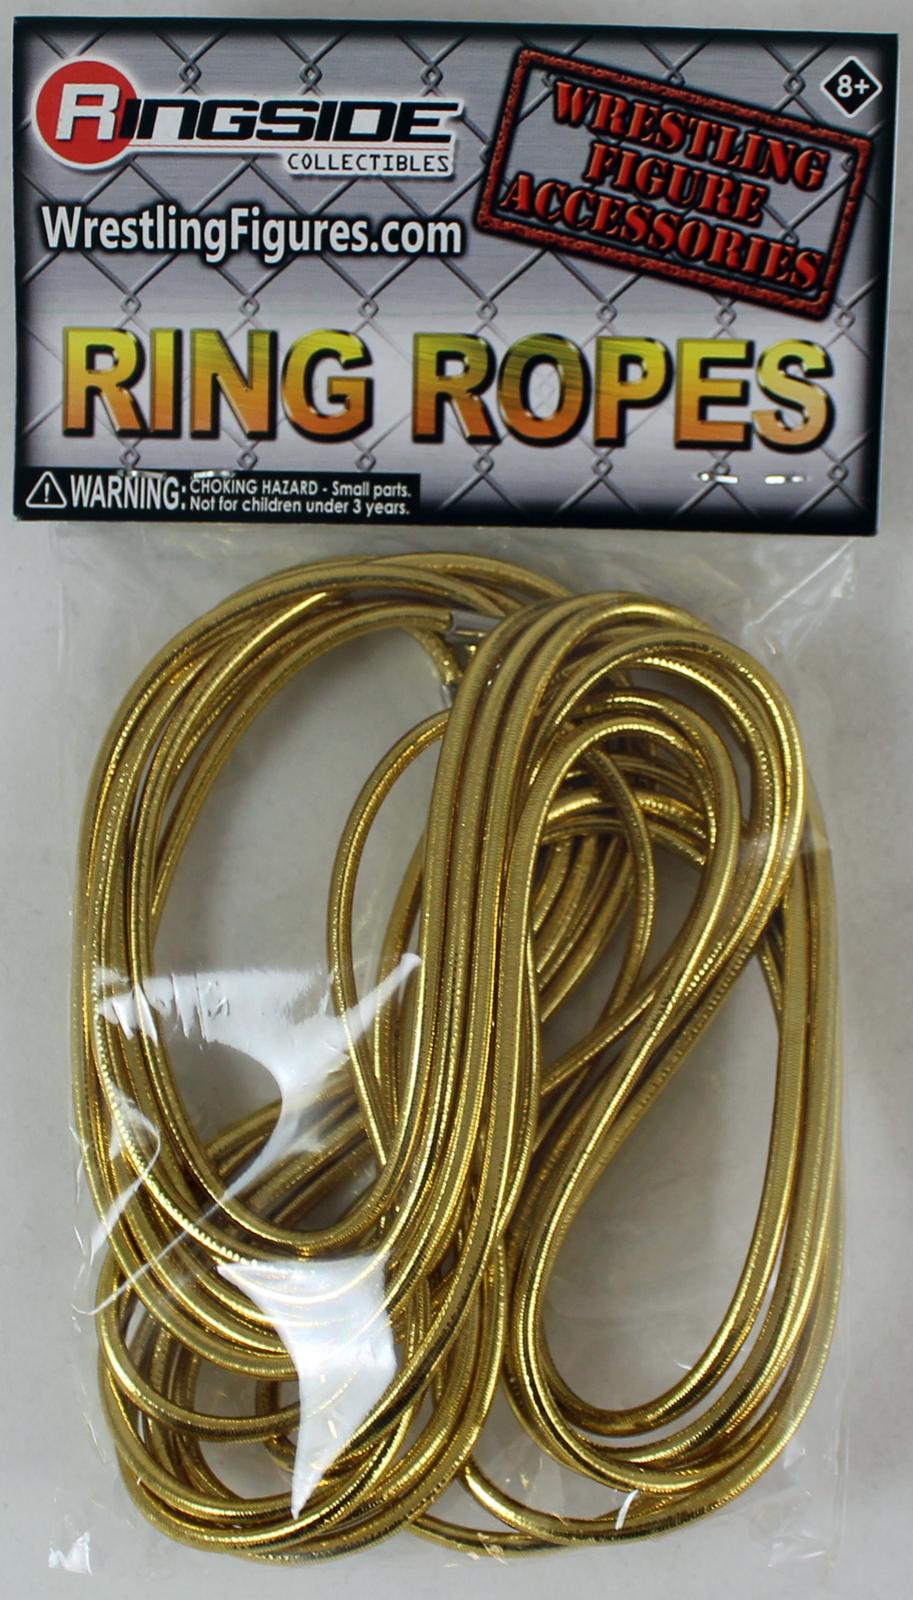 WWE Ring Ropes (Gold) -  Ringside Exclusive Toy Wrestling Action Figure Accessory PartNumber: 05248998000P KsnValue: 6398054 MfgPartNumber: REX-079